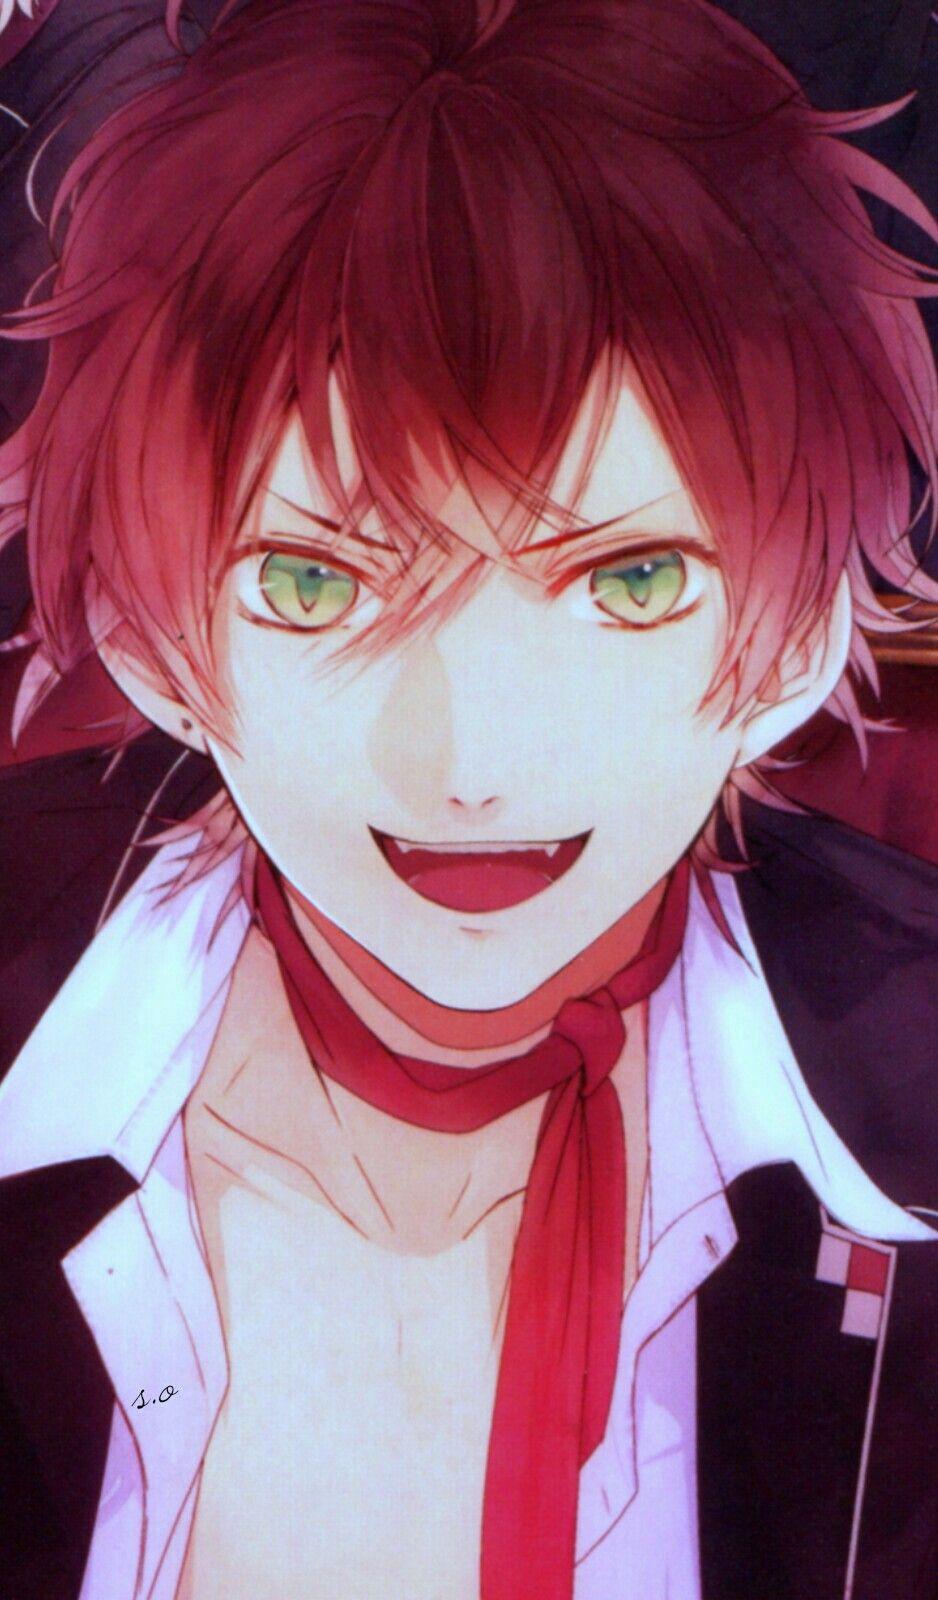 Sakamaki ayato em 2020 Anime de vampiro, Anime, Desenho